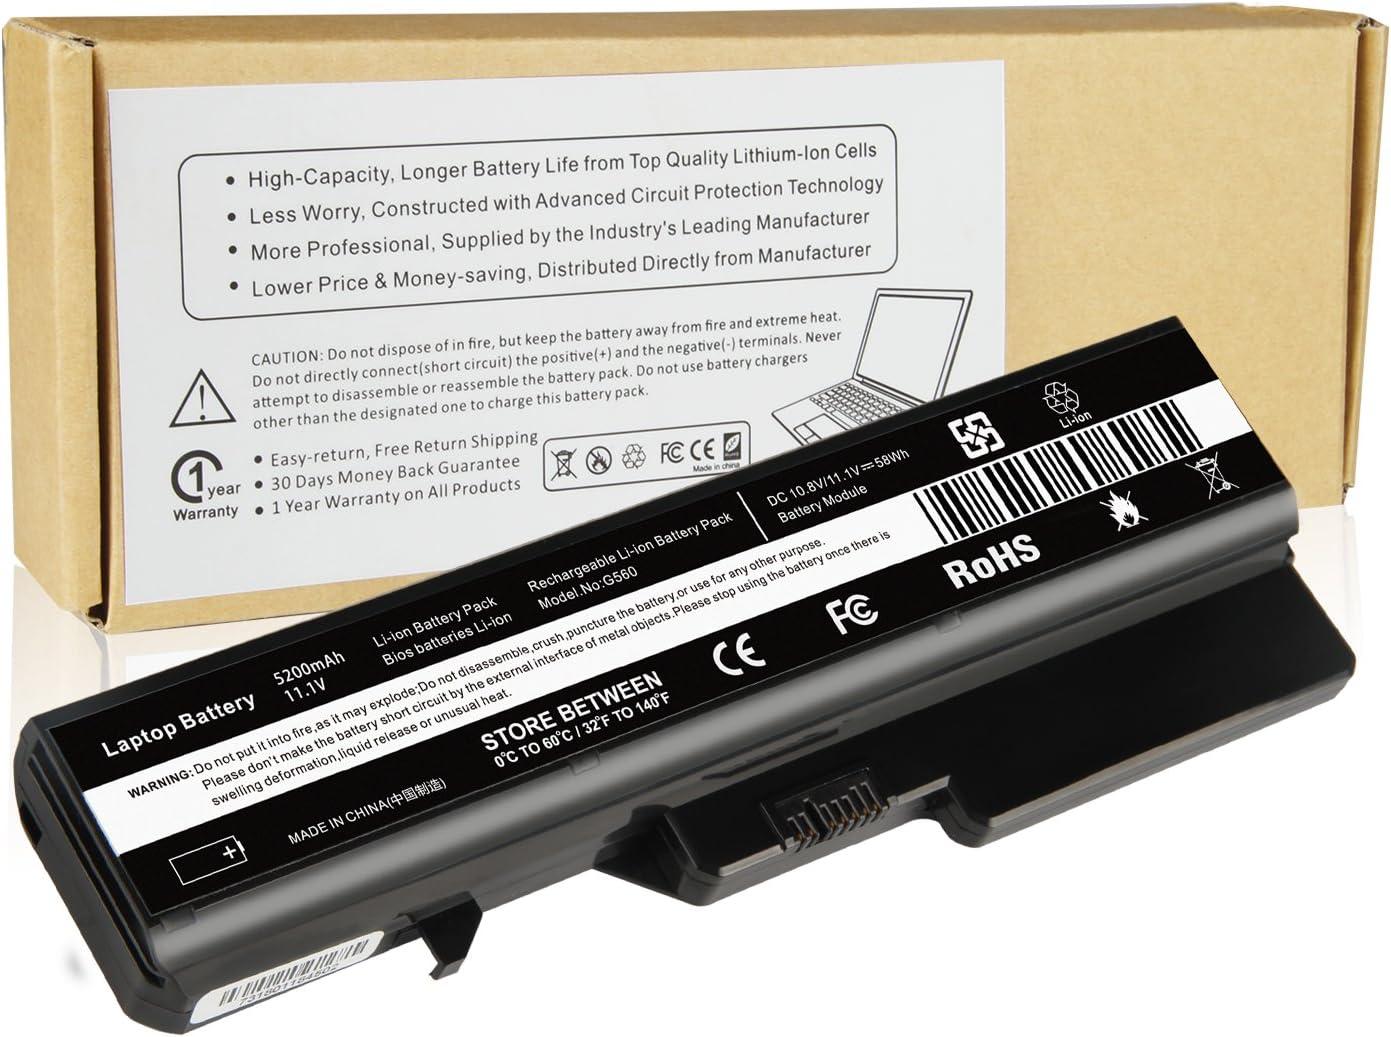 Futurebatt Notebook Battery for Lenovo B470 B570 G460 G460A G460L G465 G470 G475 G560 G565 G570 G575 IdeaPad V360 V370 V470 V570 Z370 Z460 Z465 Z470 Z475 Z560 Z565 Z570 Z575 L08S6Y21 L09M6Y02 L09L6Y02